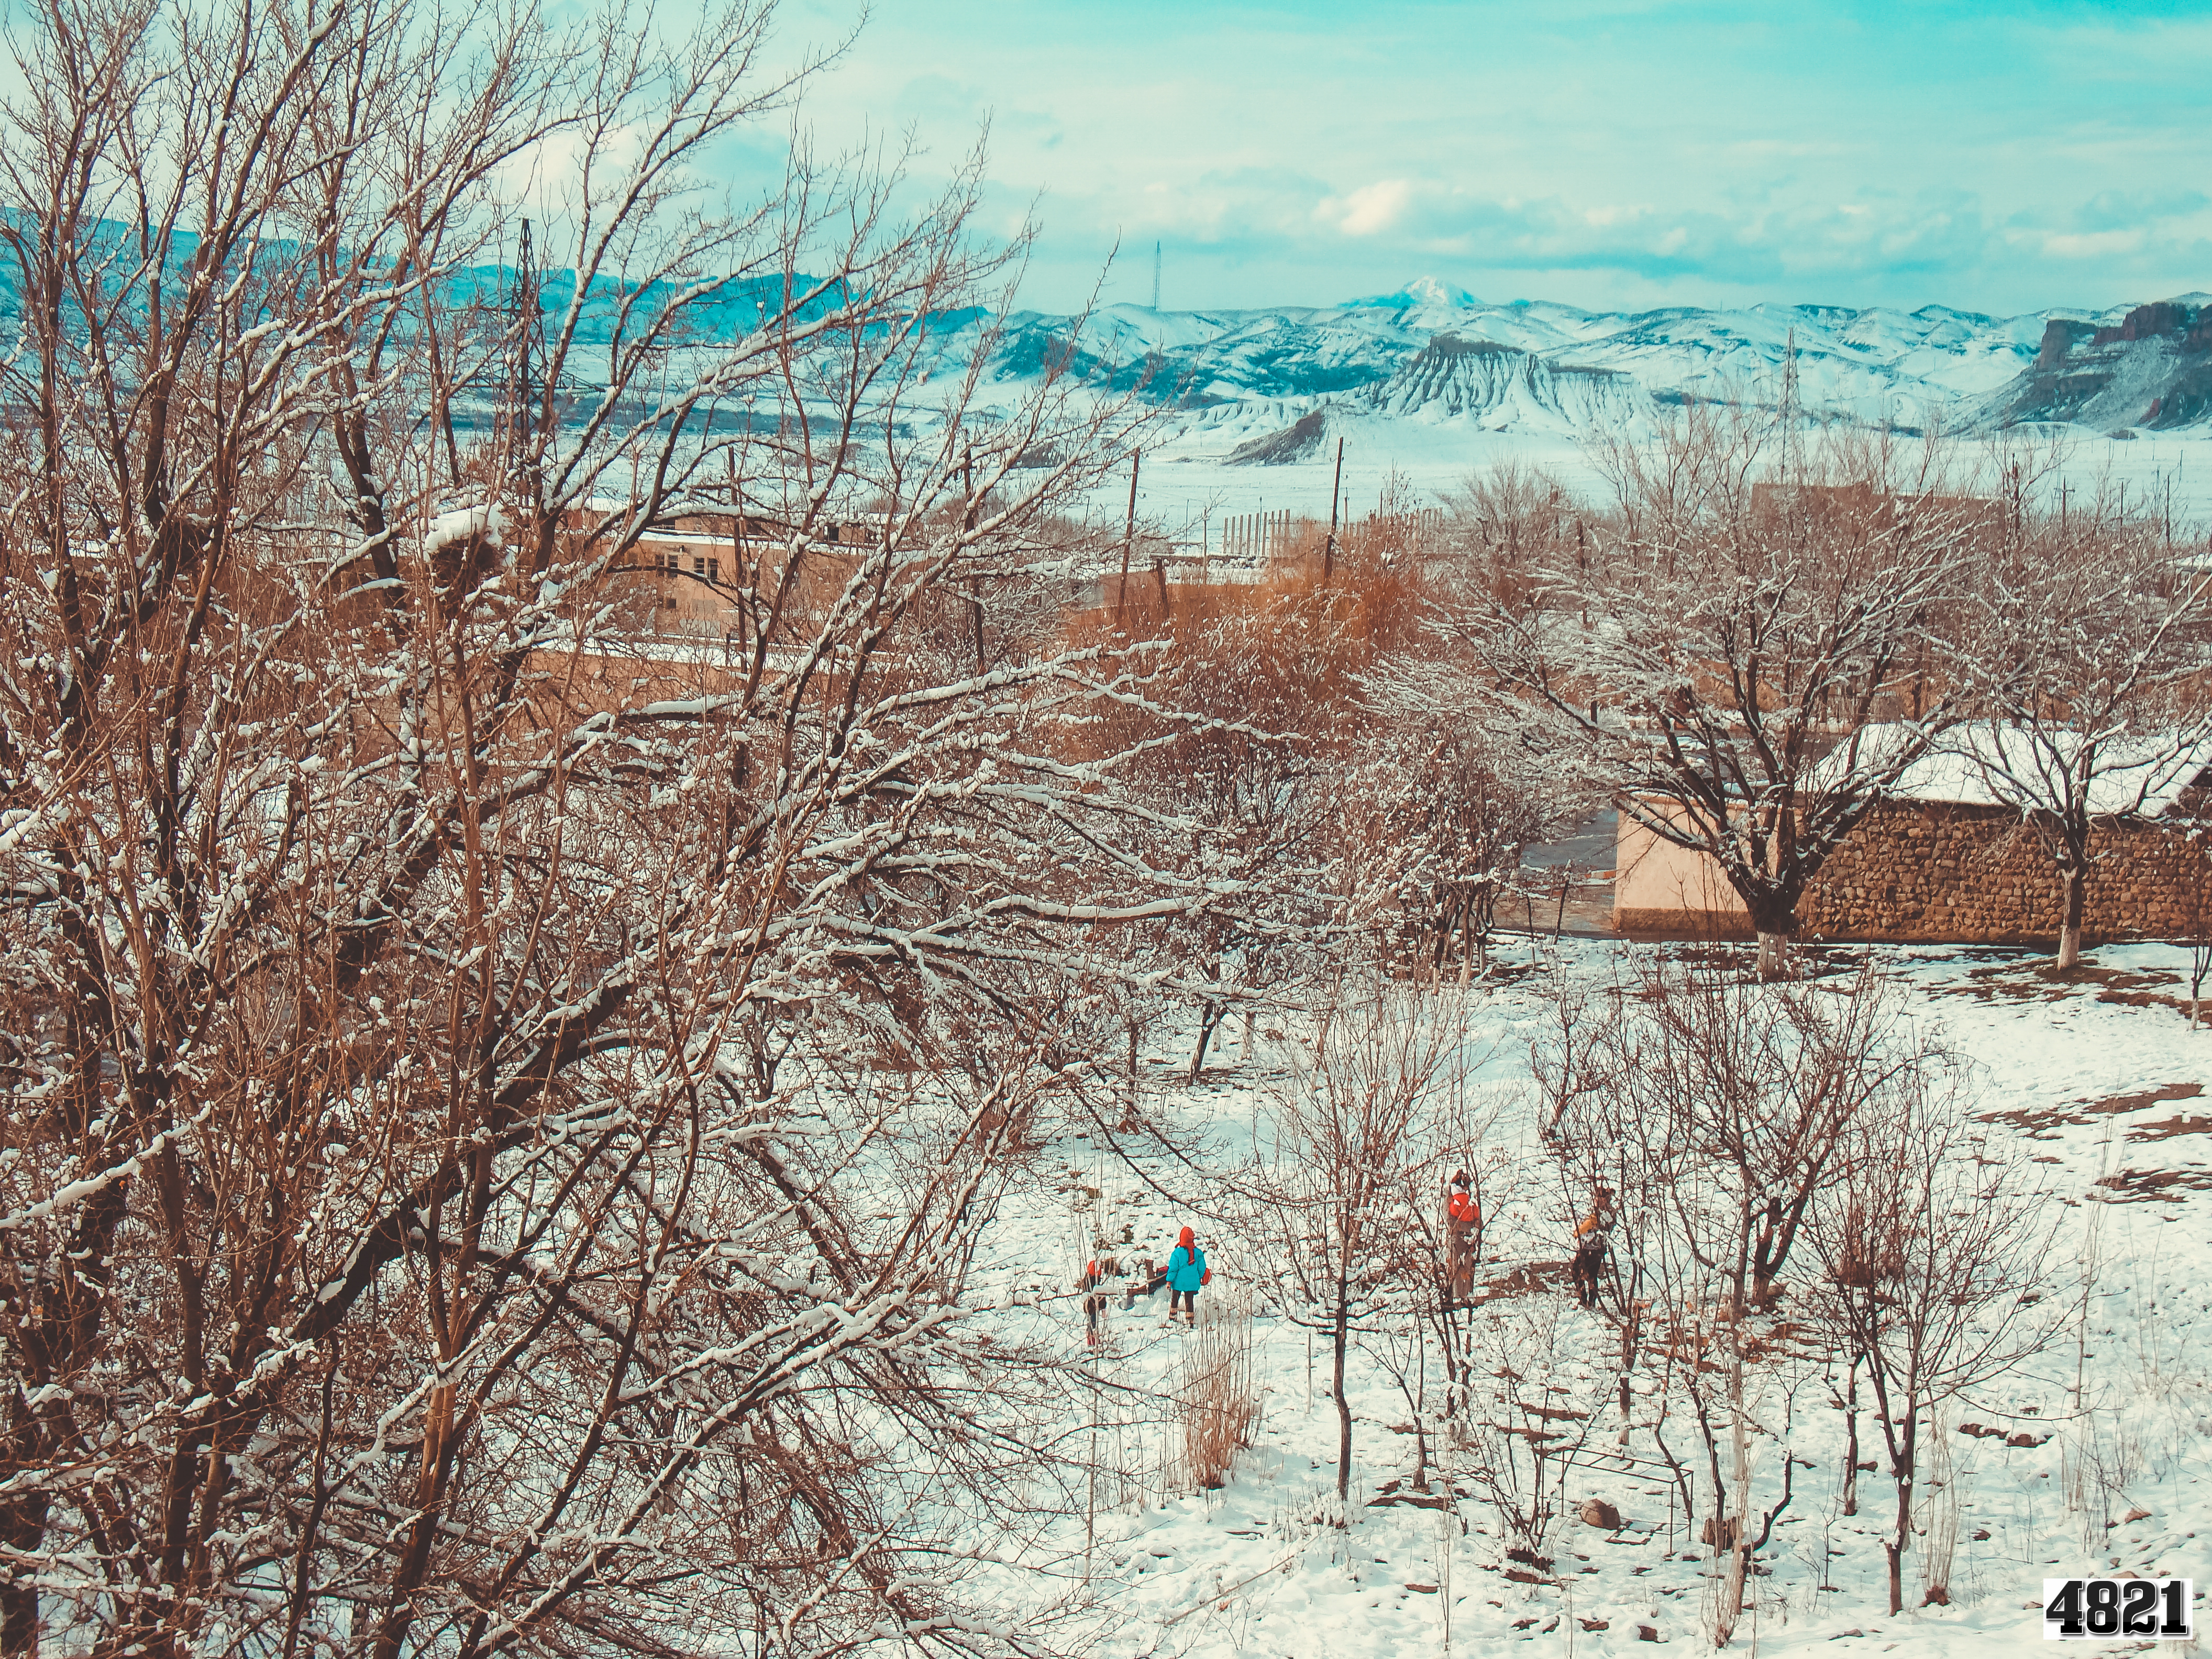 Səkil Winter Instagram Fb Snow Best Photo Sekil Resim Yukle Endir Indir Profil Sekilleri Svln4821 Jpg Vikipediya